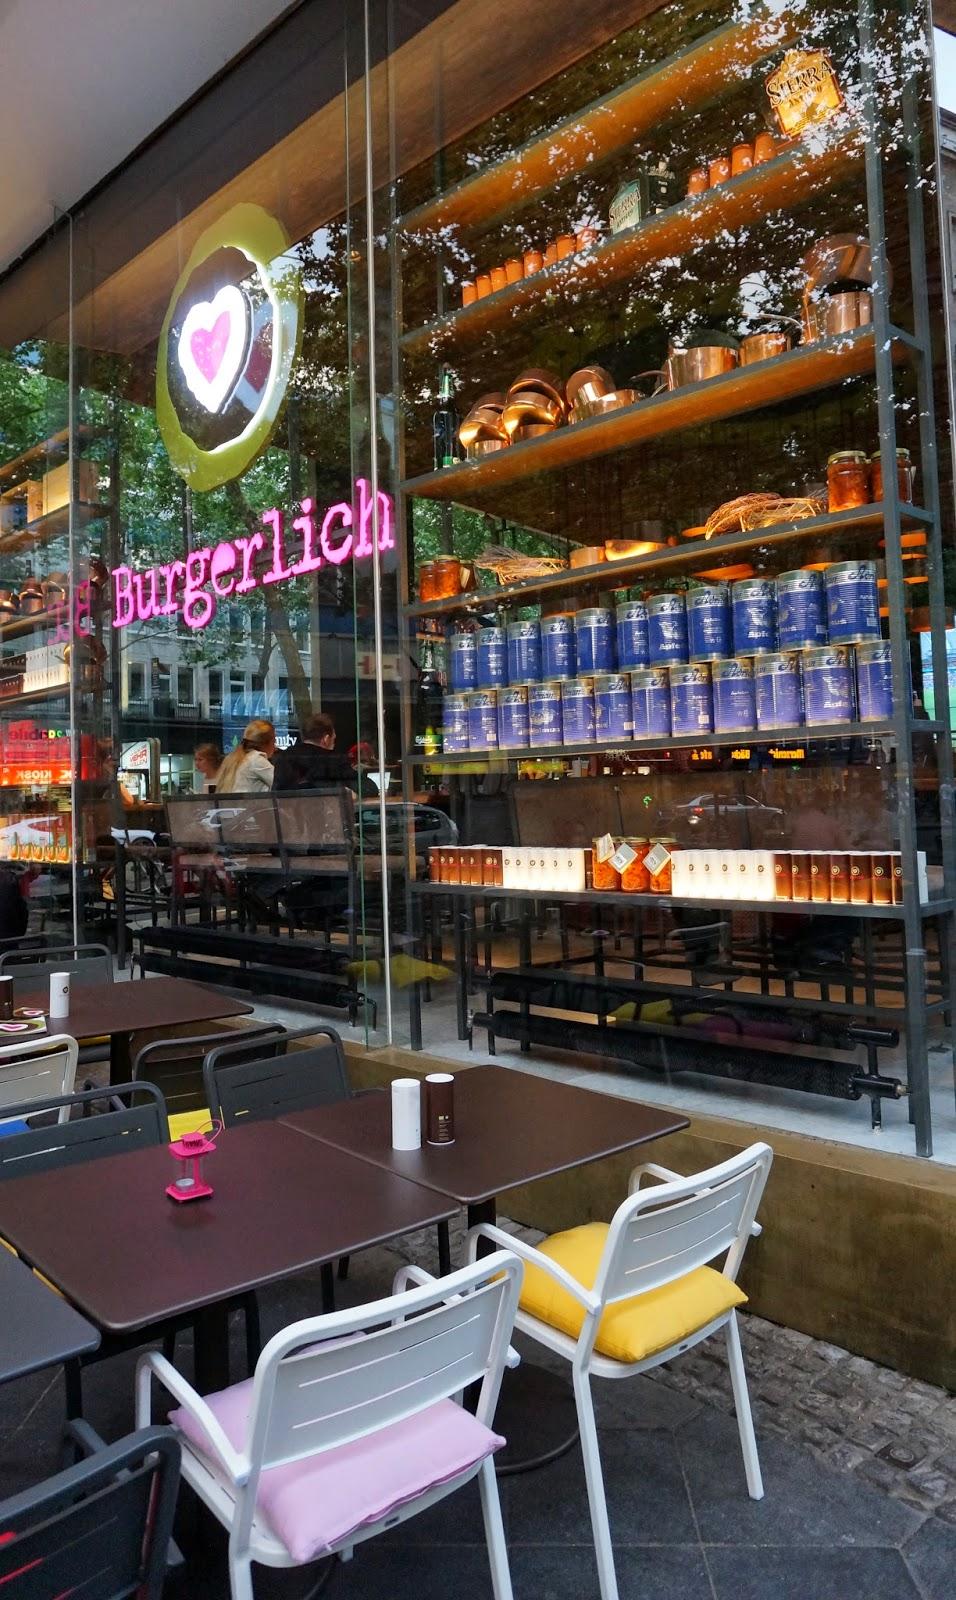 Burgerladen Köln, Burger essen in Köln, beste Burger, Erfahrungen Burgerlich, Burgerlich Fotos